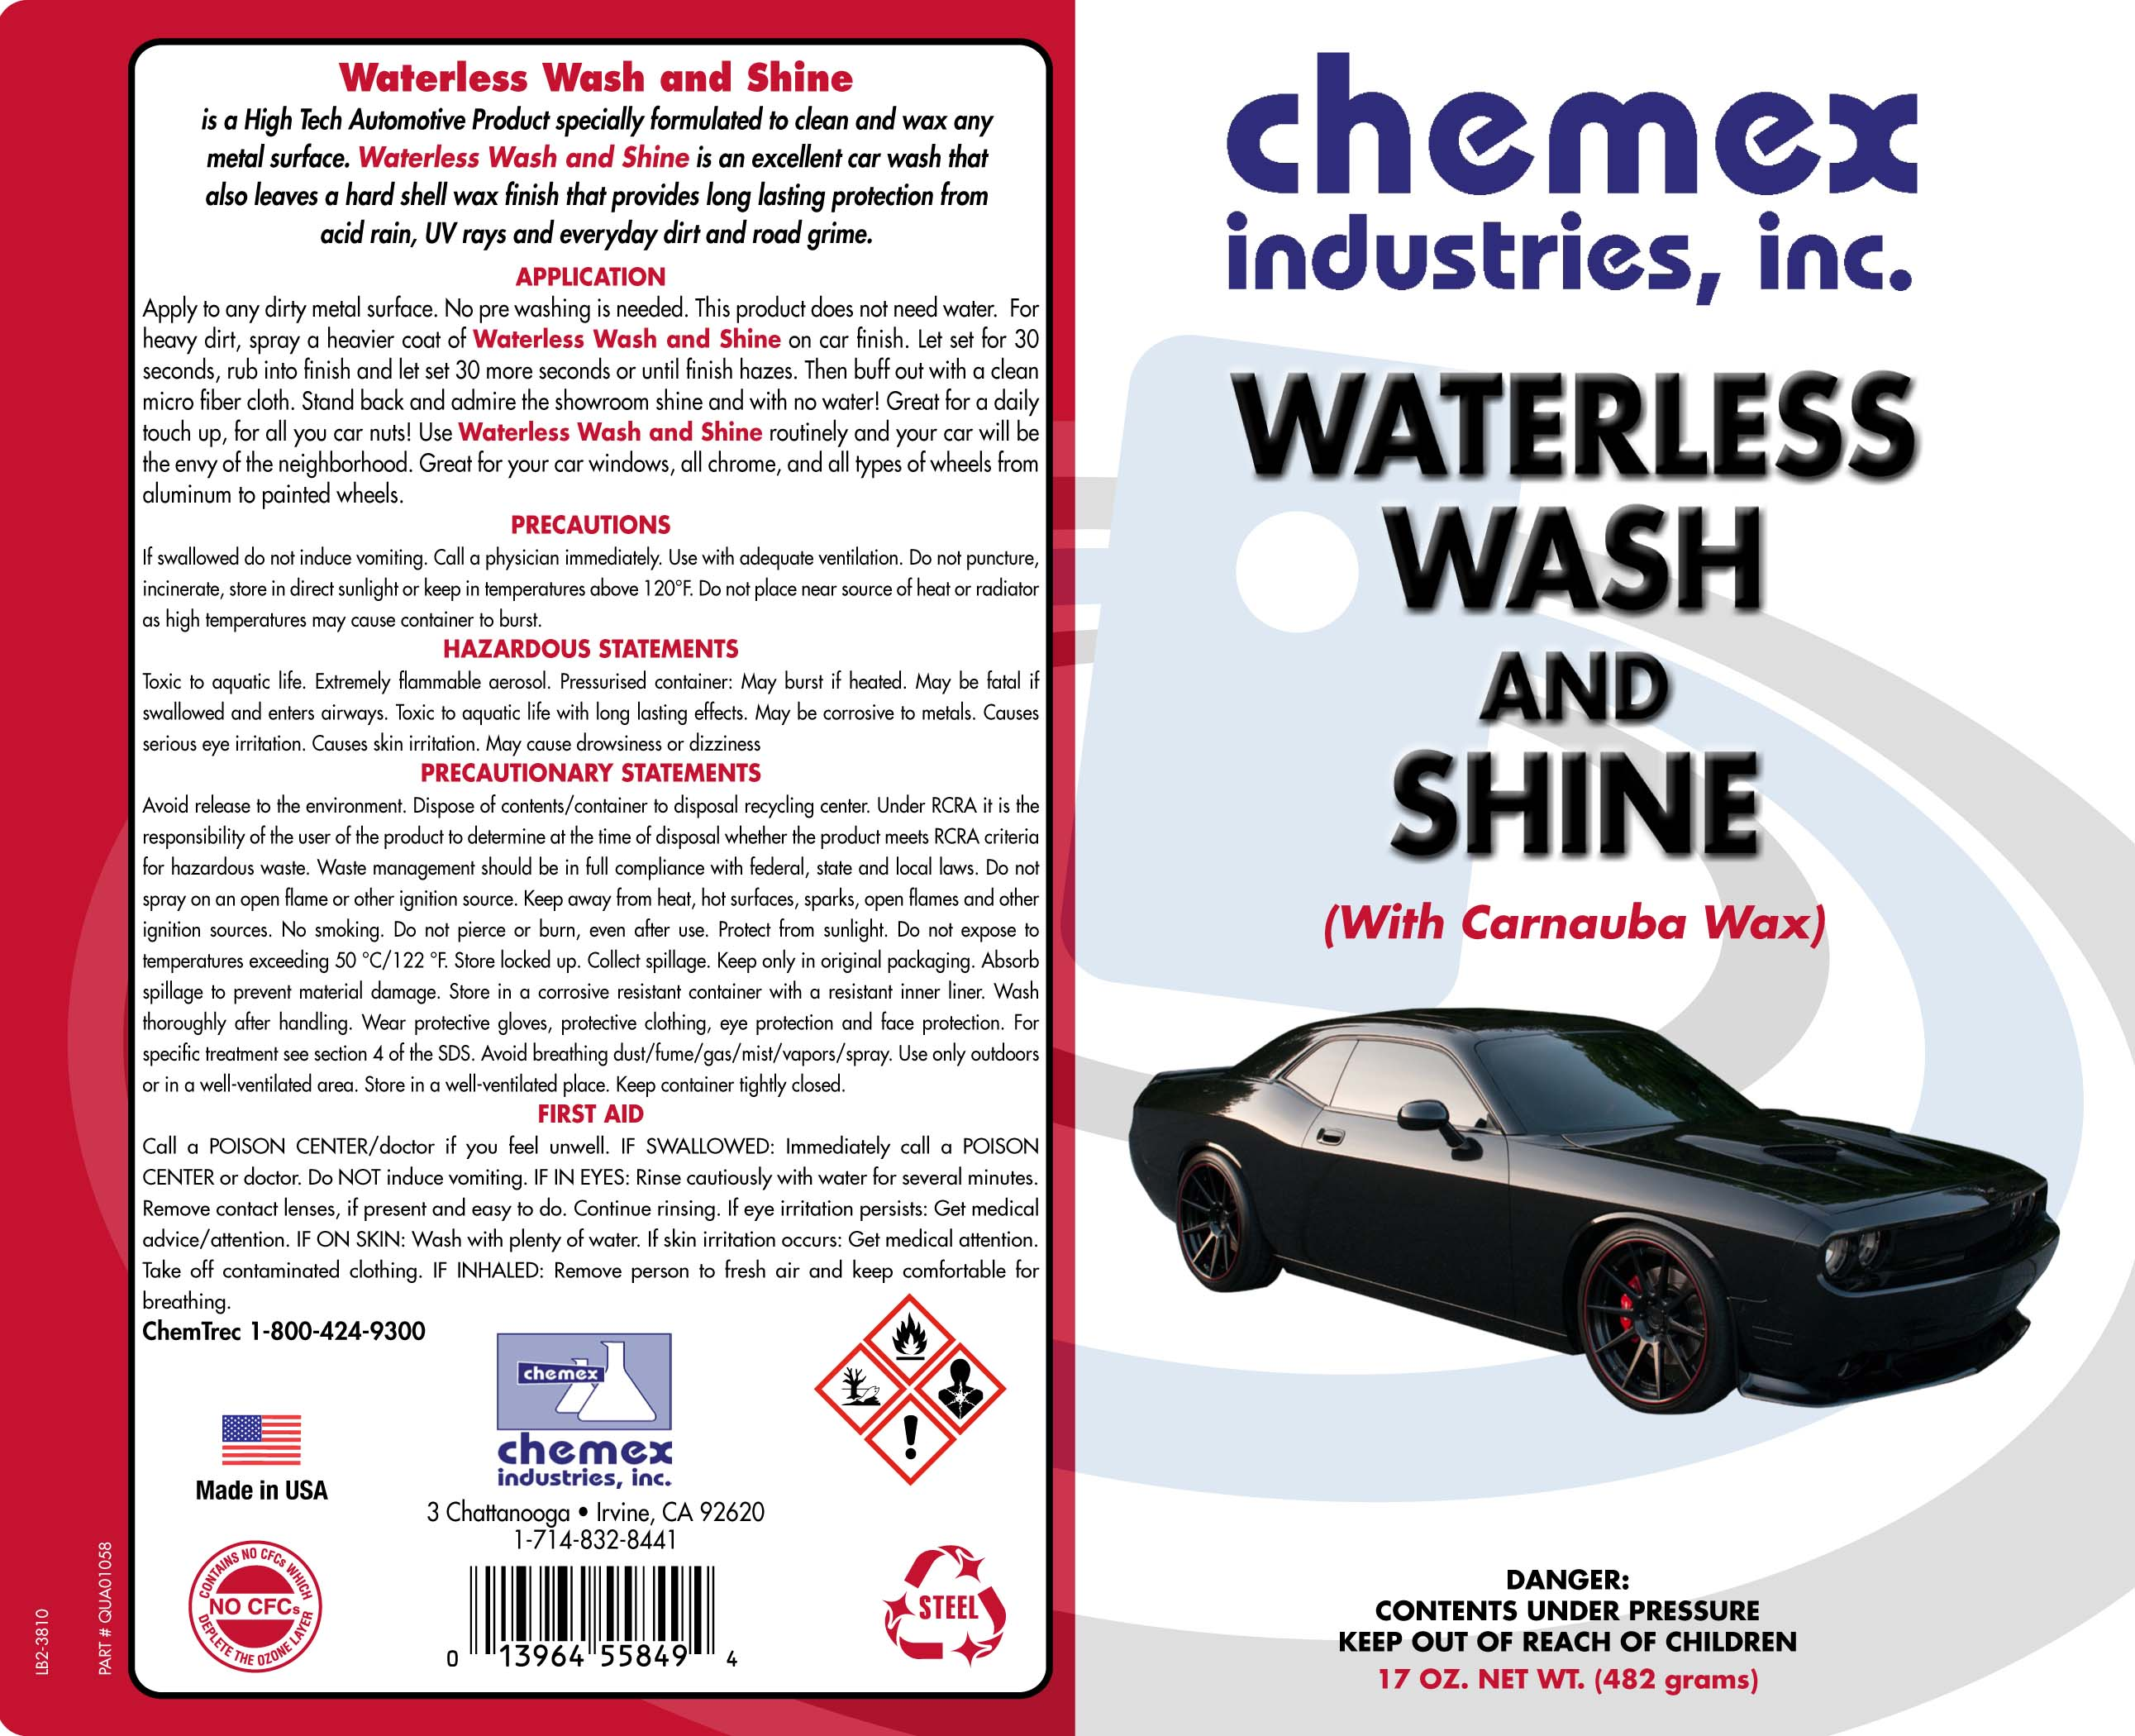 waterless wash and shine